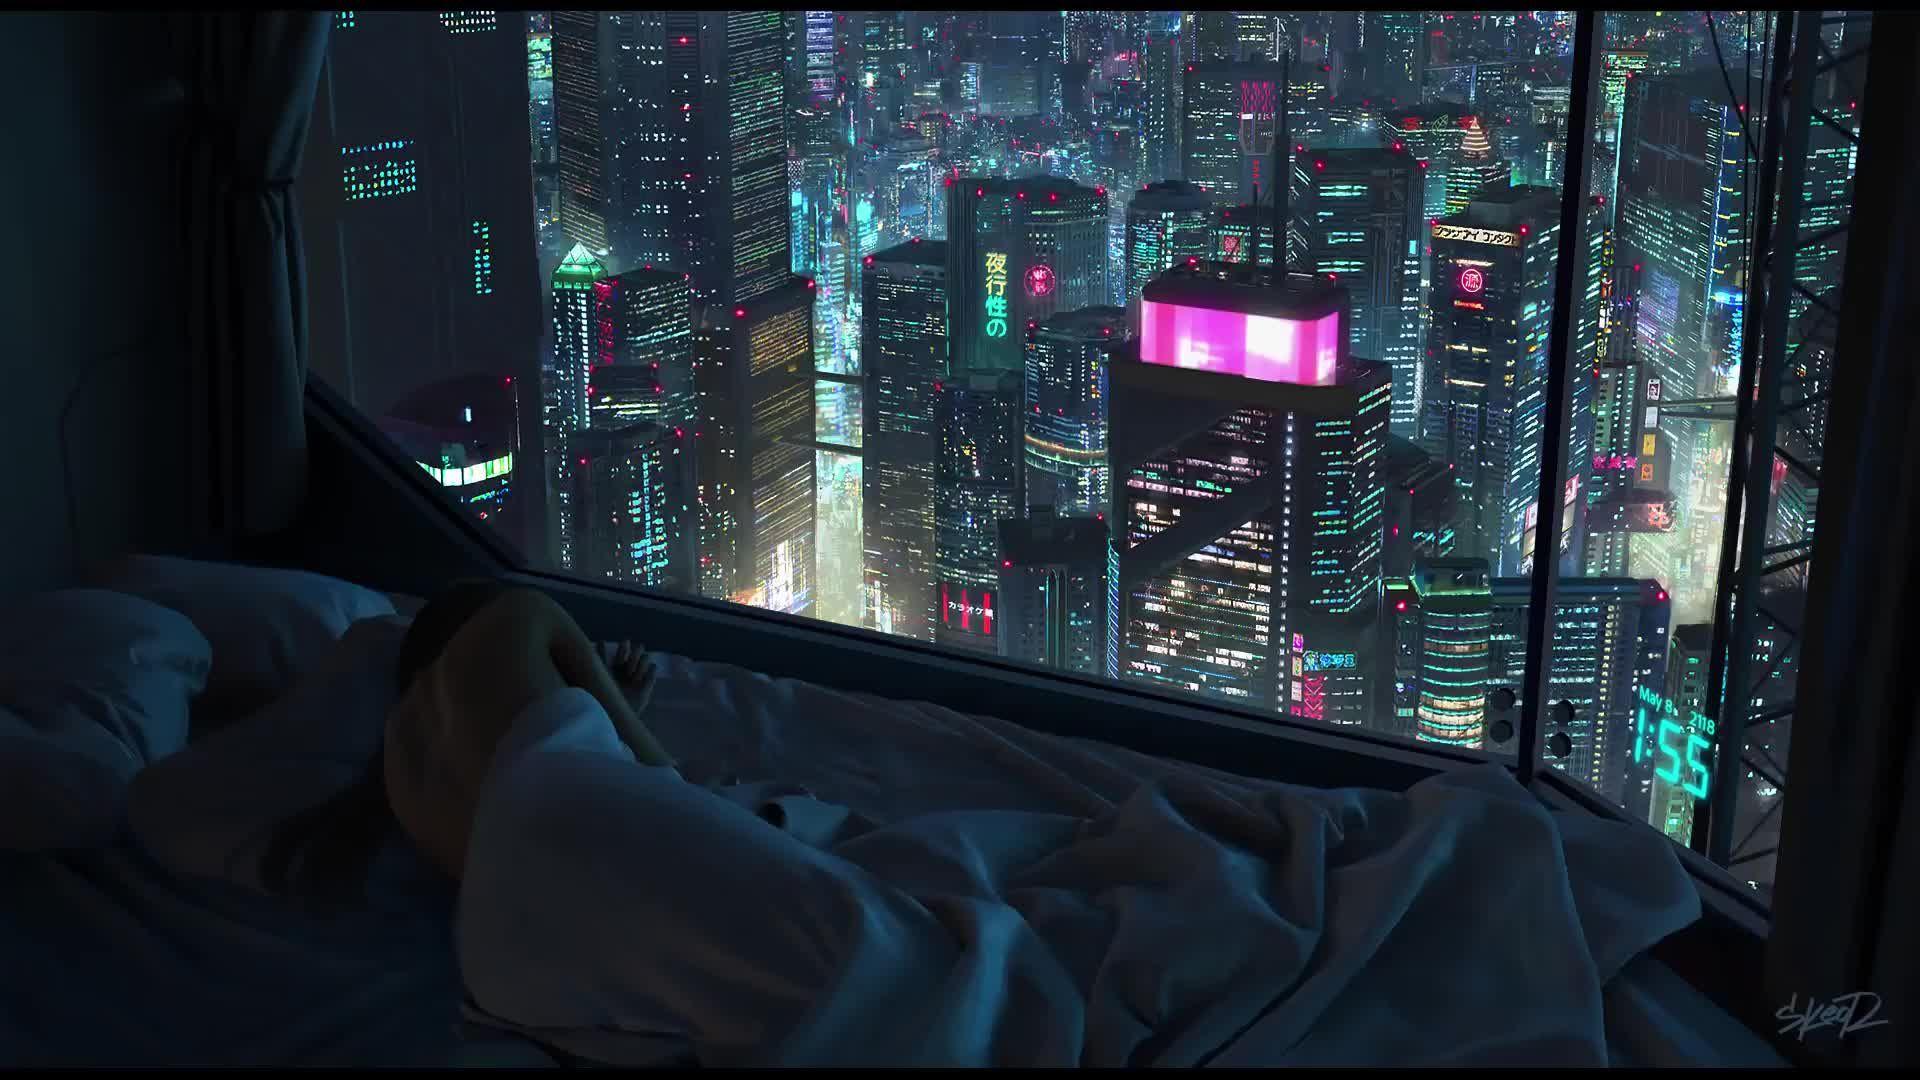 Cyberpunk City Night Time Hd Live Wallpaper Cyberpunk City Cyberpunk Aesthetic Futuristic City